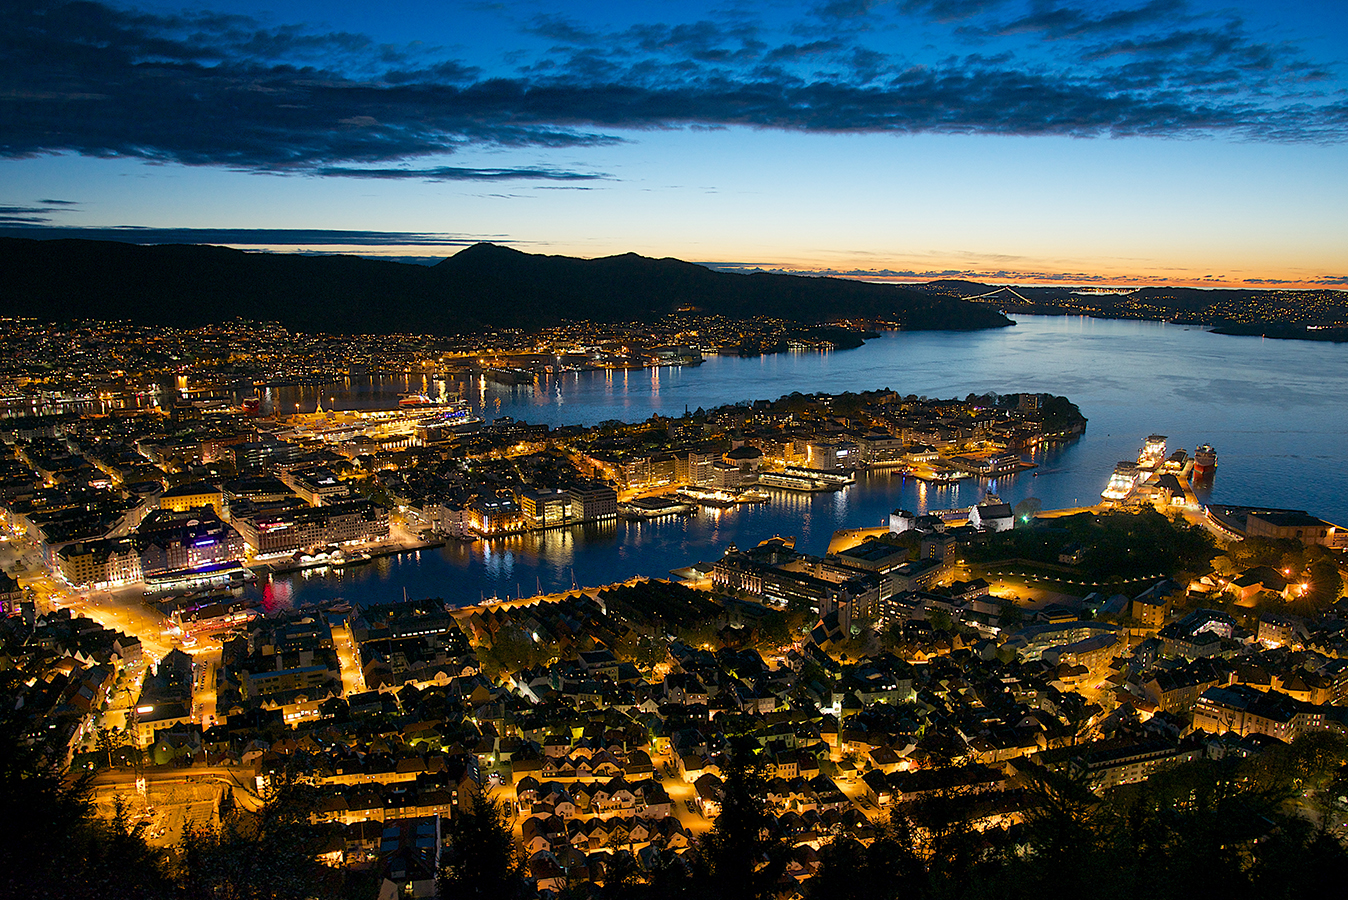 Fløyen view by night